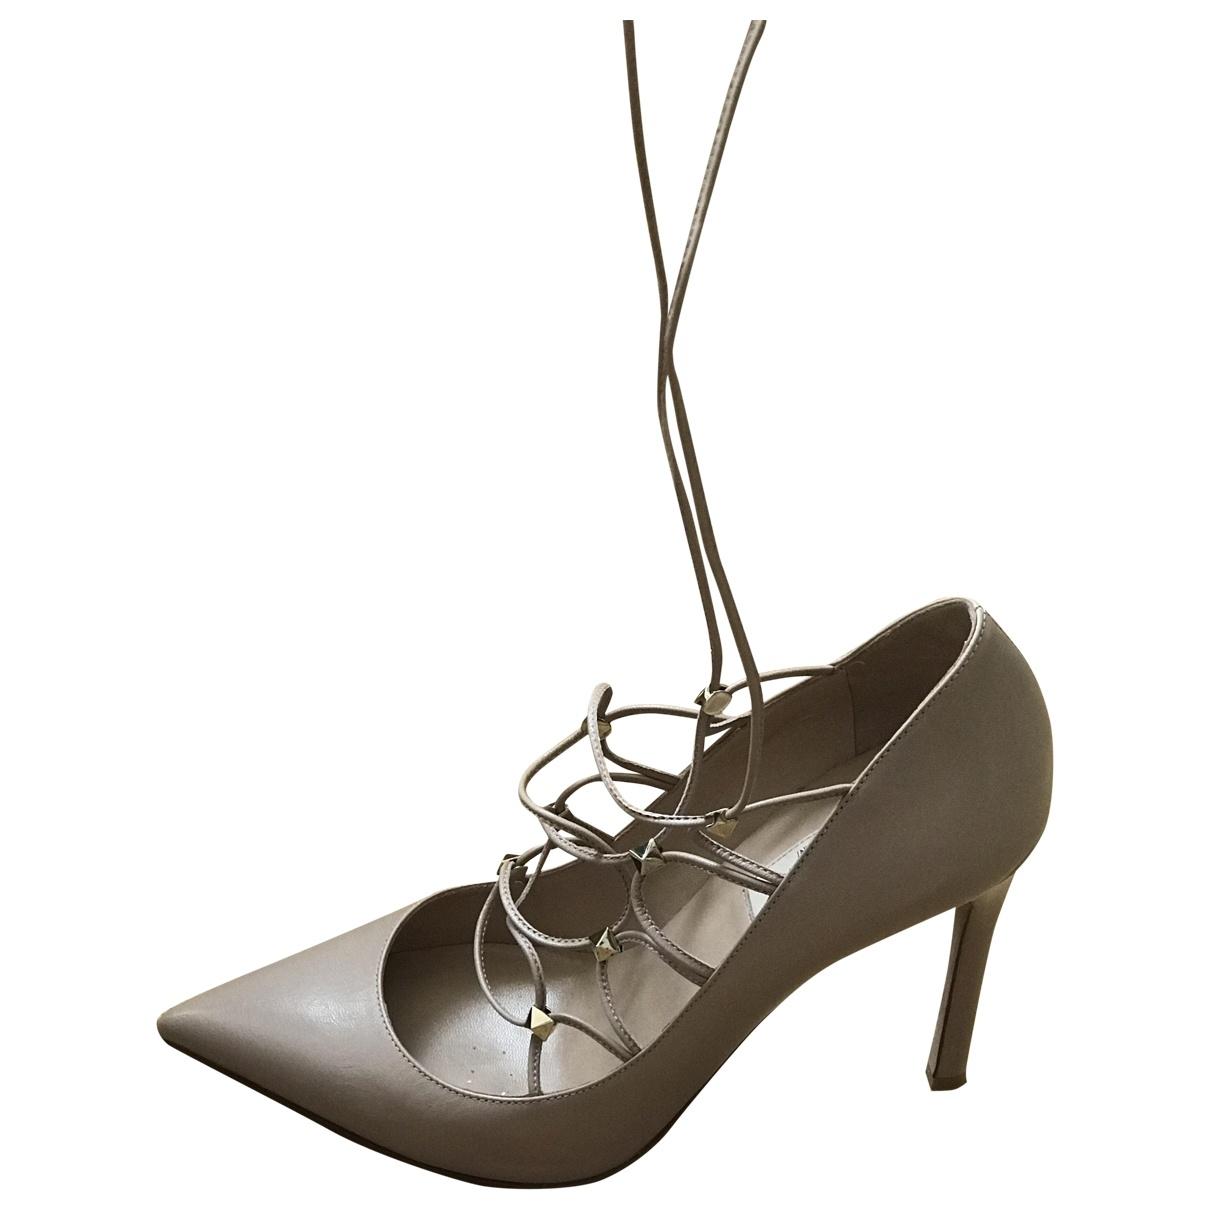 Valentino Garavani \N Beige Leather Heels for Women 38 EU